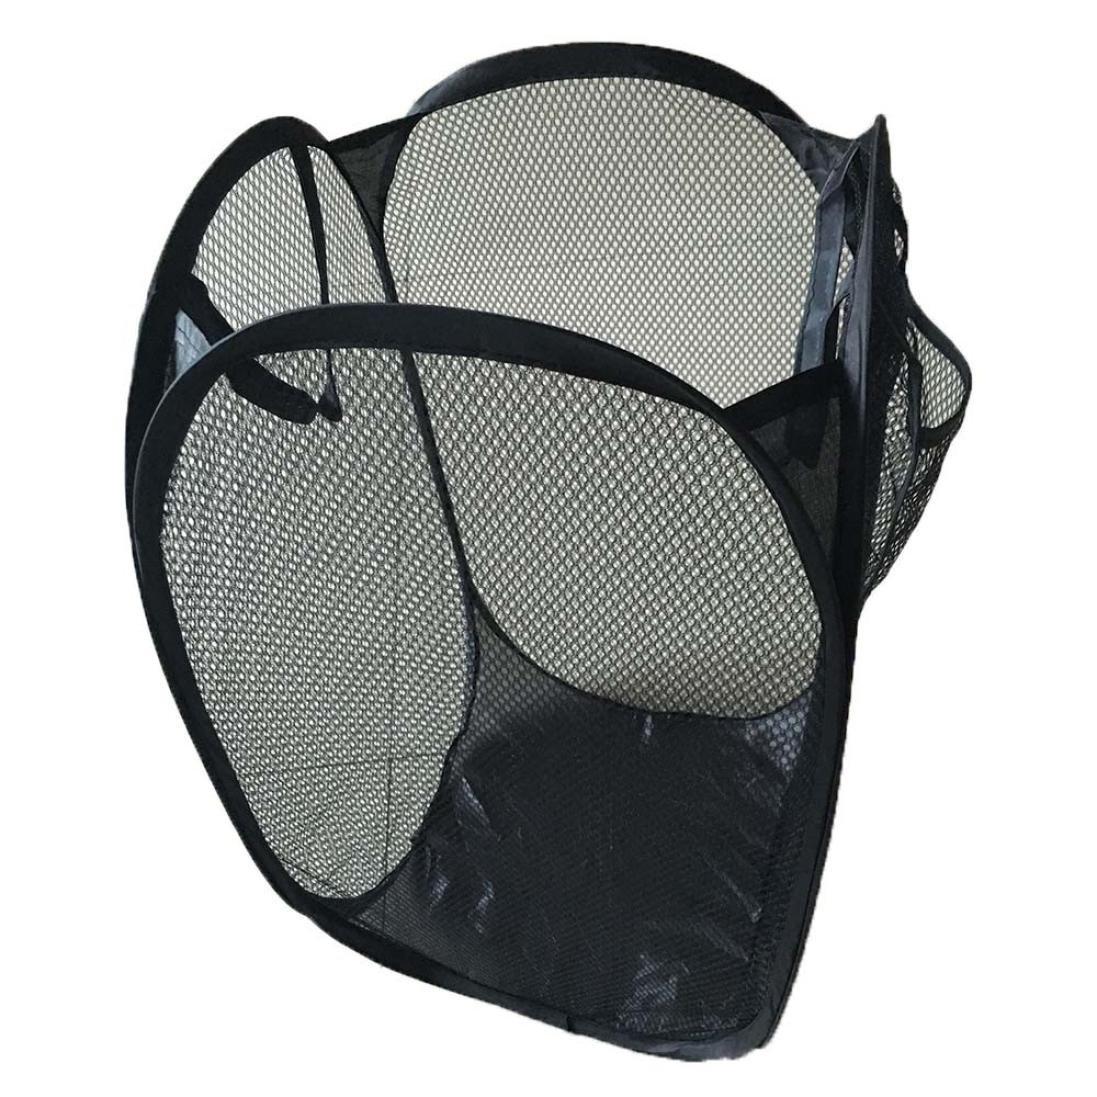 LtrottedJ Foldable Pop Up Washing Laundry Basket Bag ,Hamper Mesh Storage Pueple